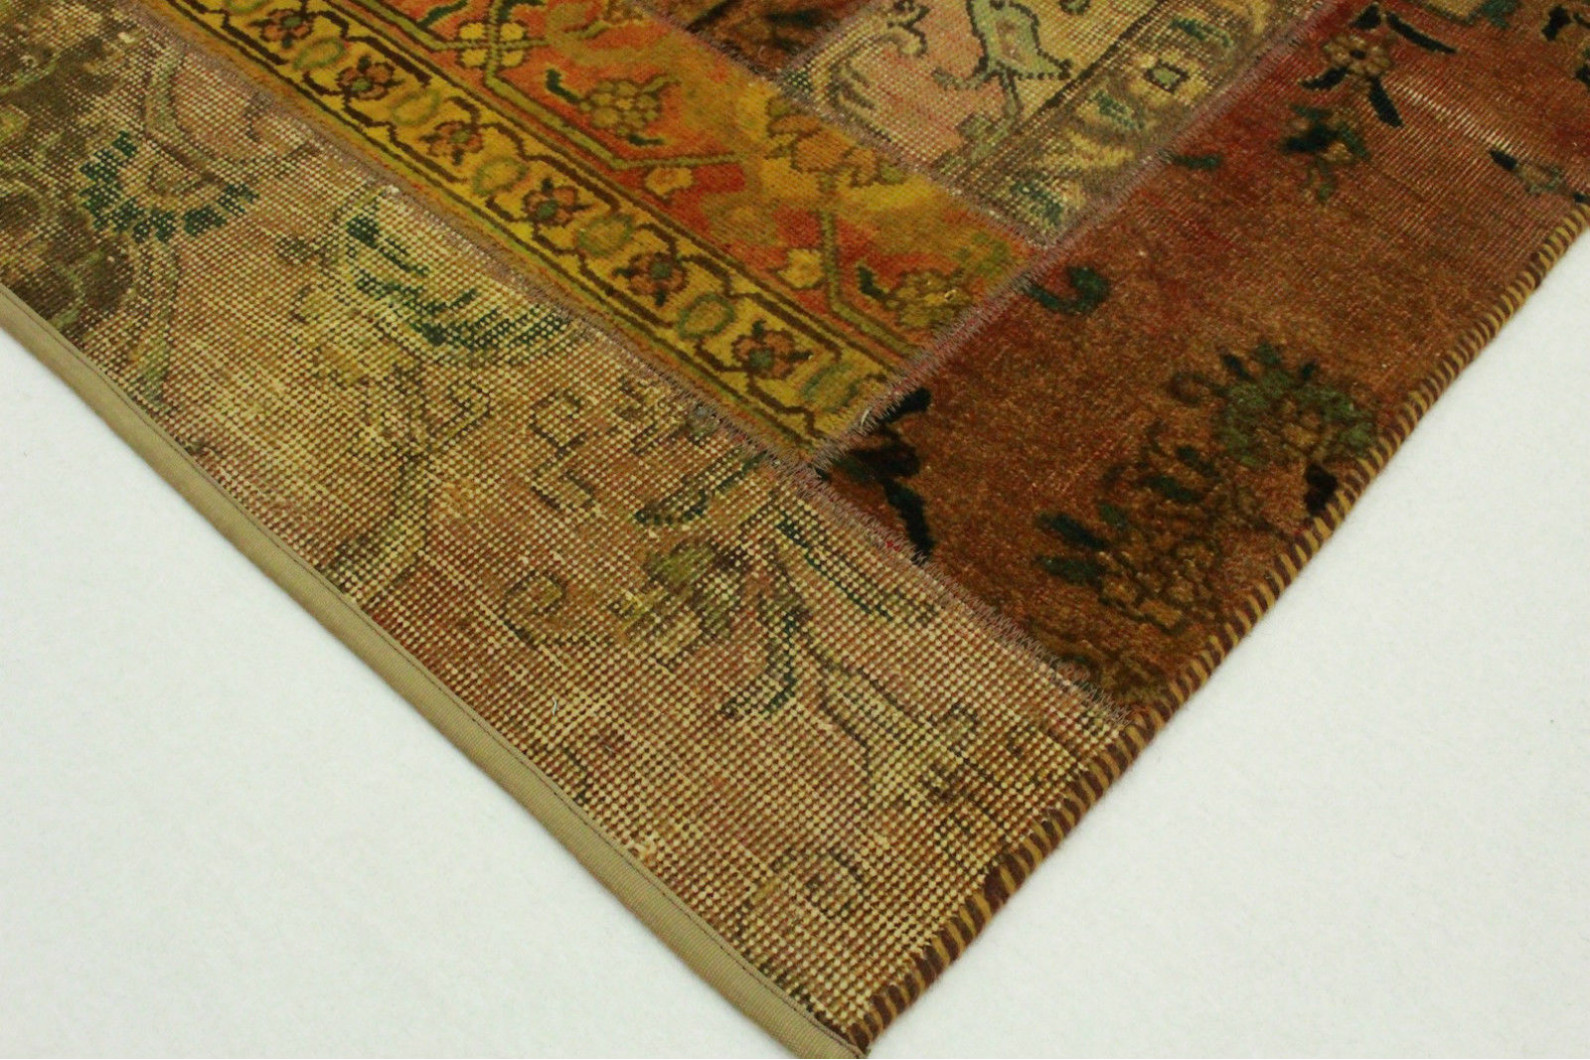 patchwork teppich orange braun curry in 150x100cm 1001. Black Bedroom Furniture Sets. Home Design Ideas